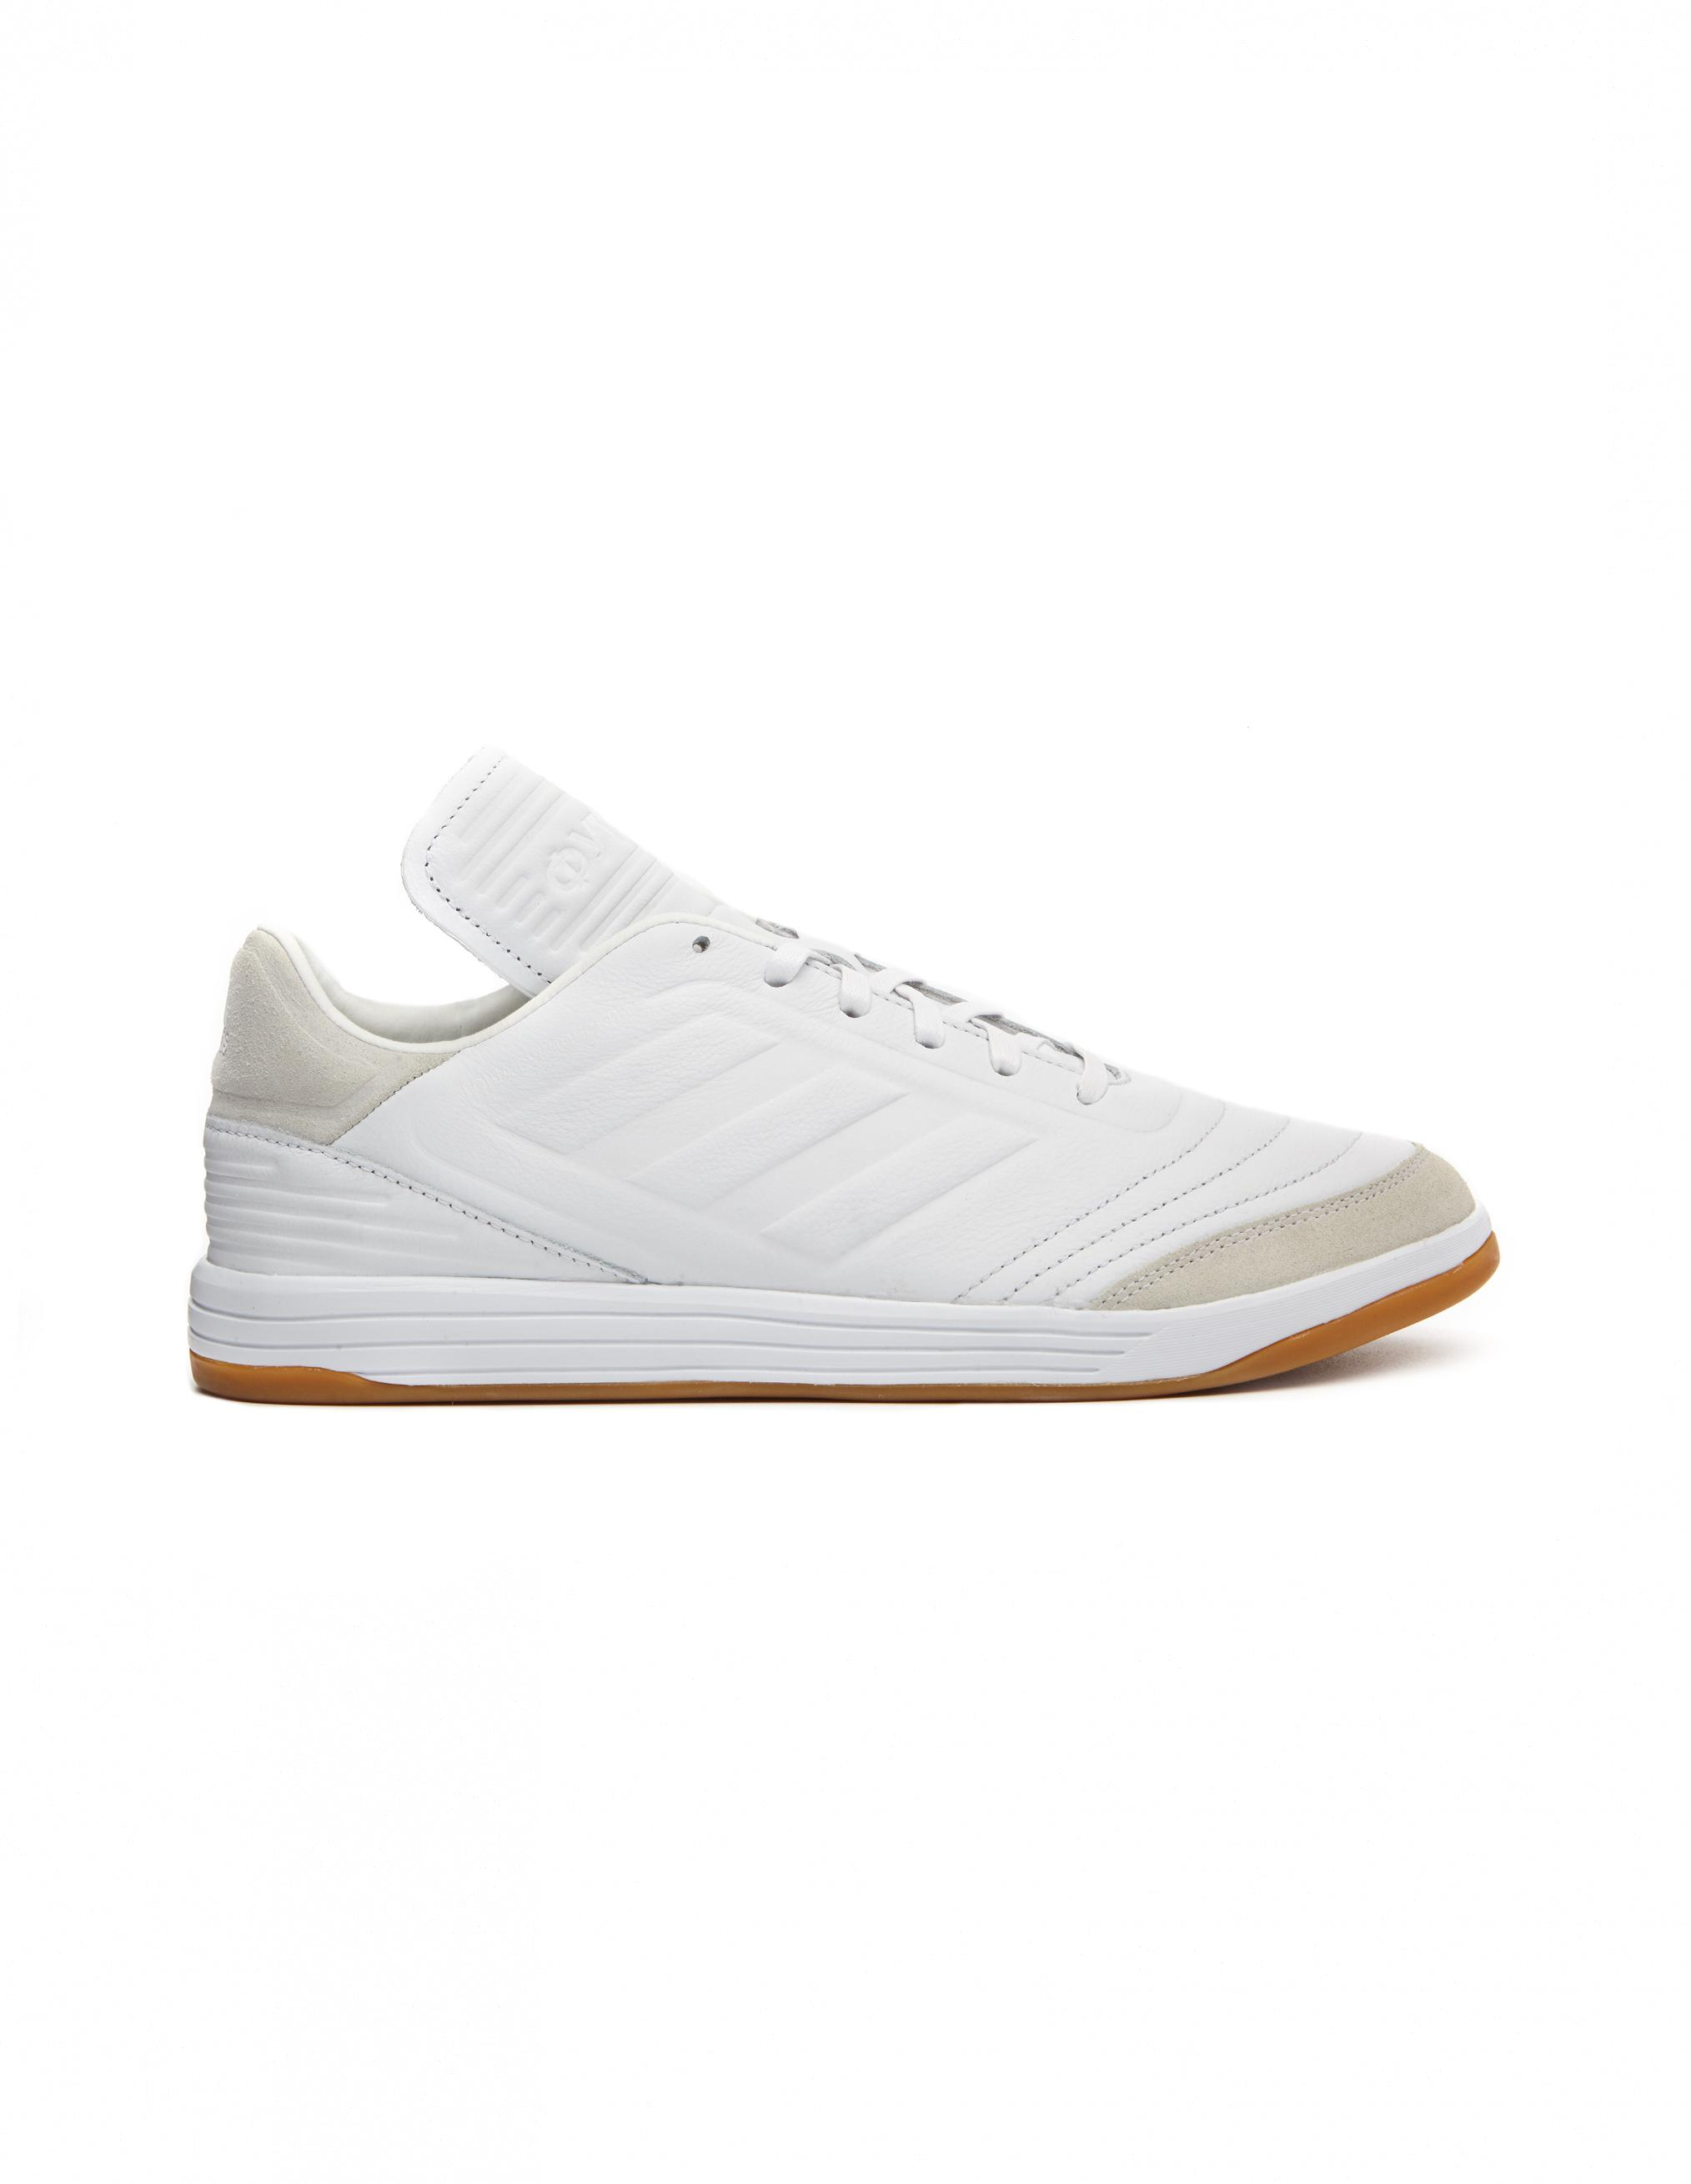 timeless design f9192 31c93 Men's White Adidas Football Copa Sneaker Sneakers